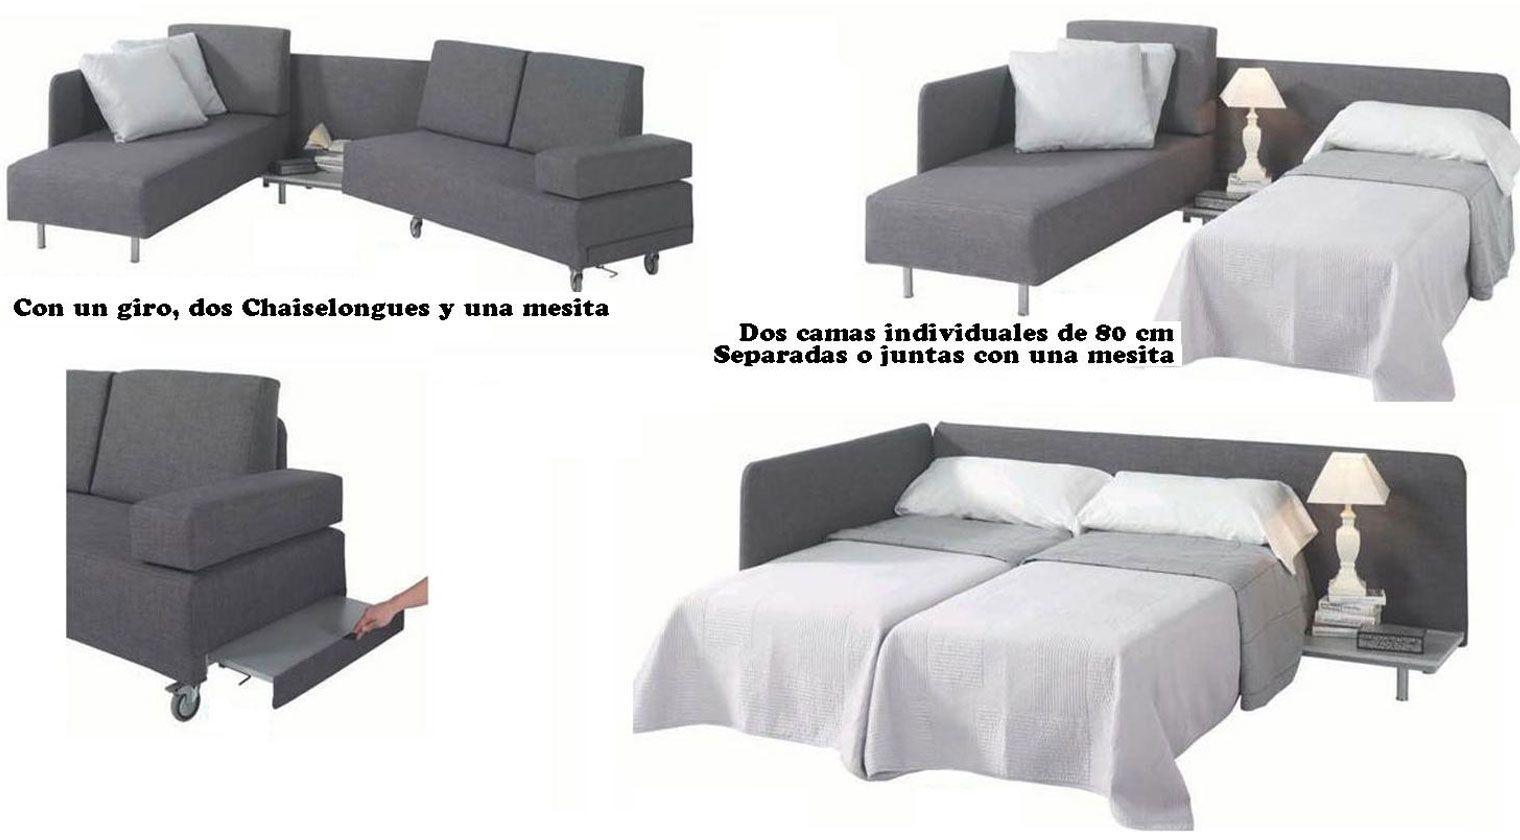 Sof cama laval sofas cama convertibles for Cama individual tipo sofa